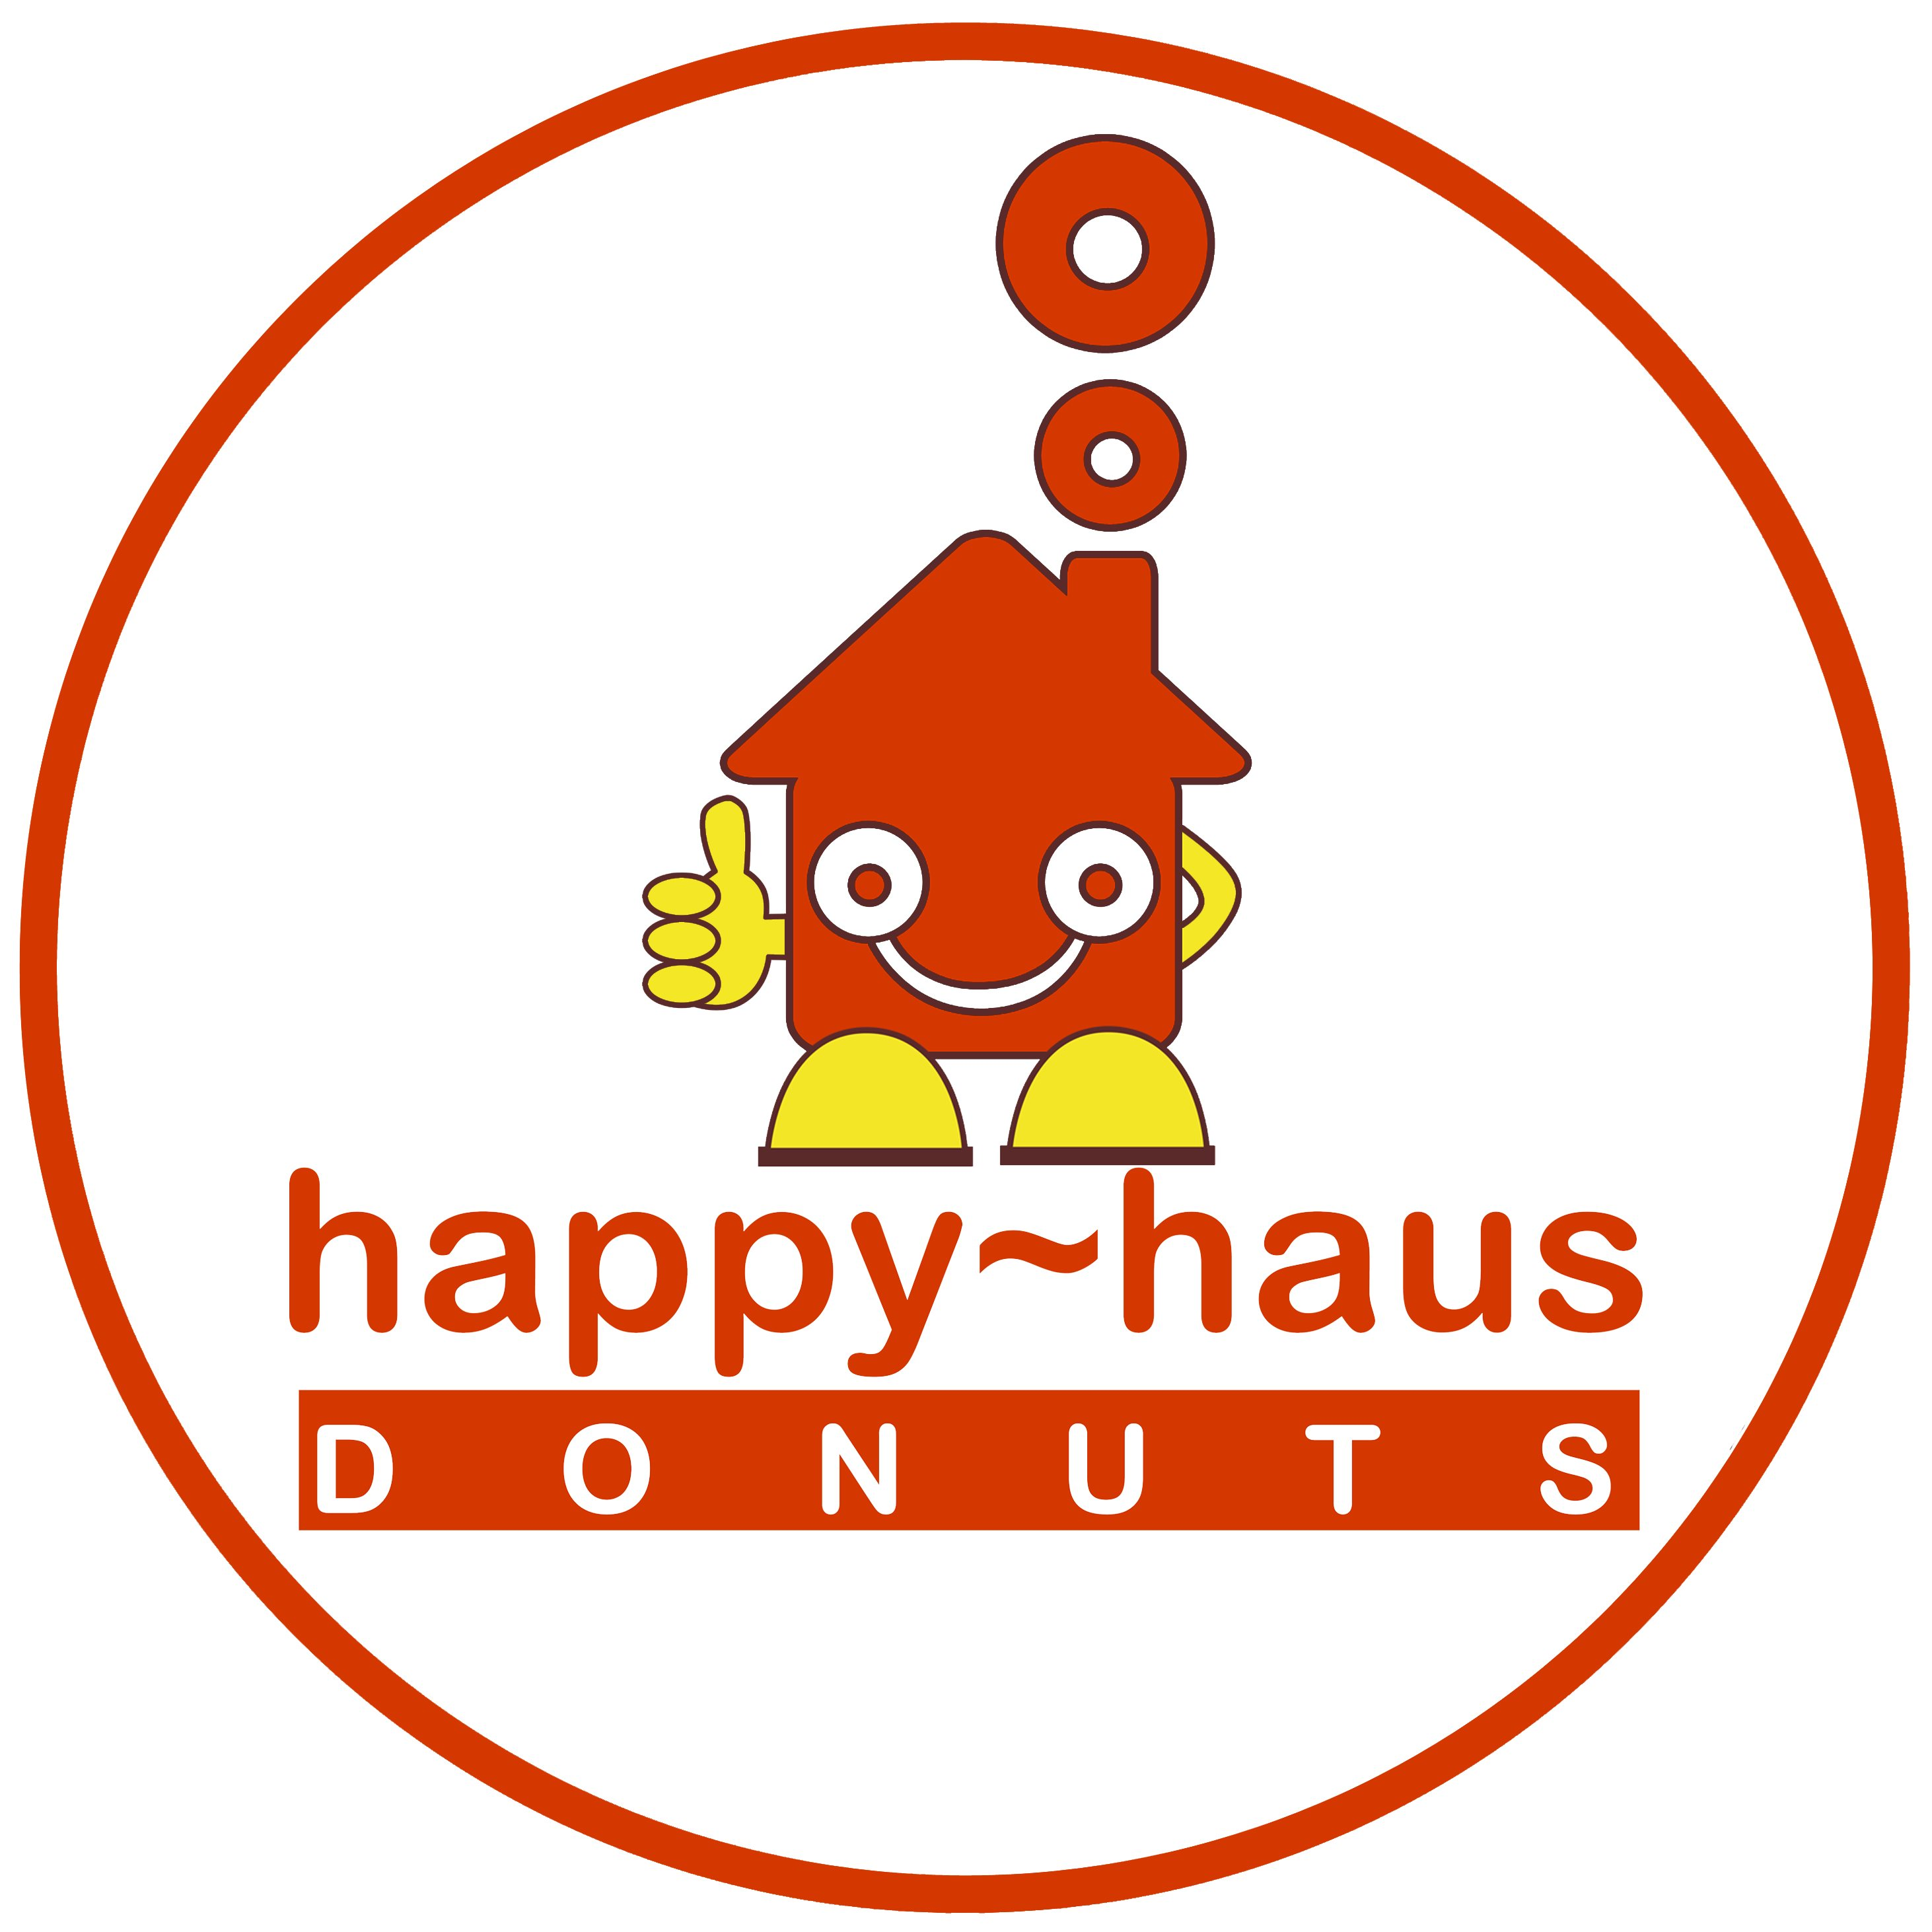 Happy-haus Food Corporation